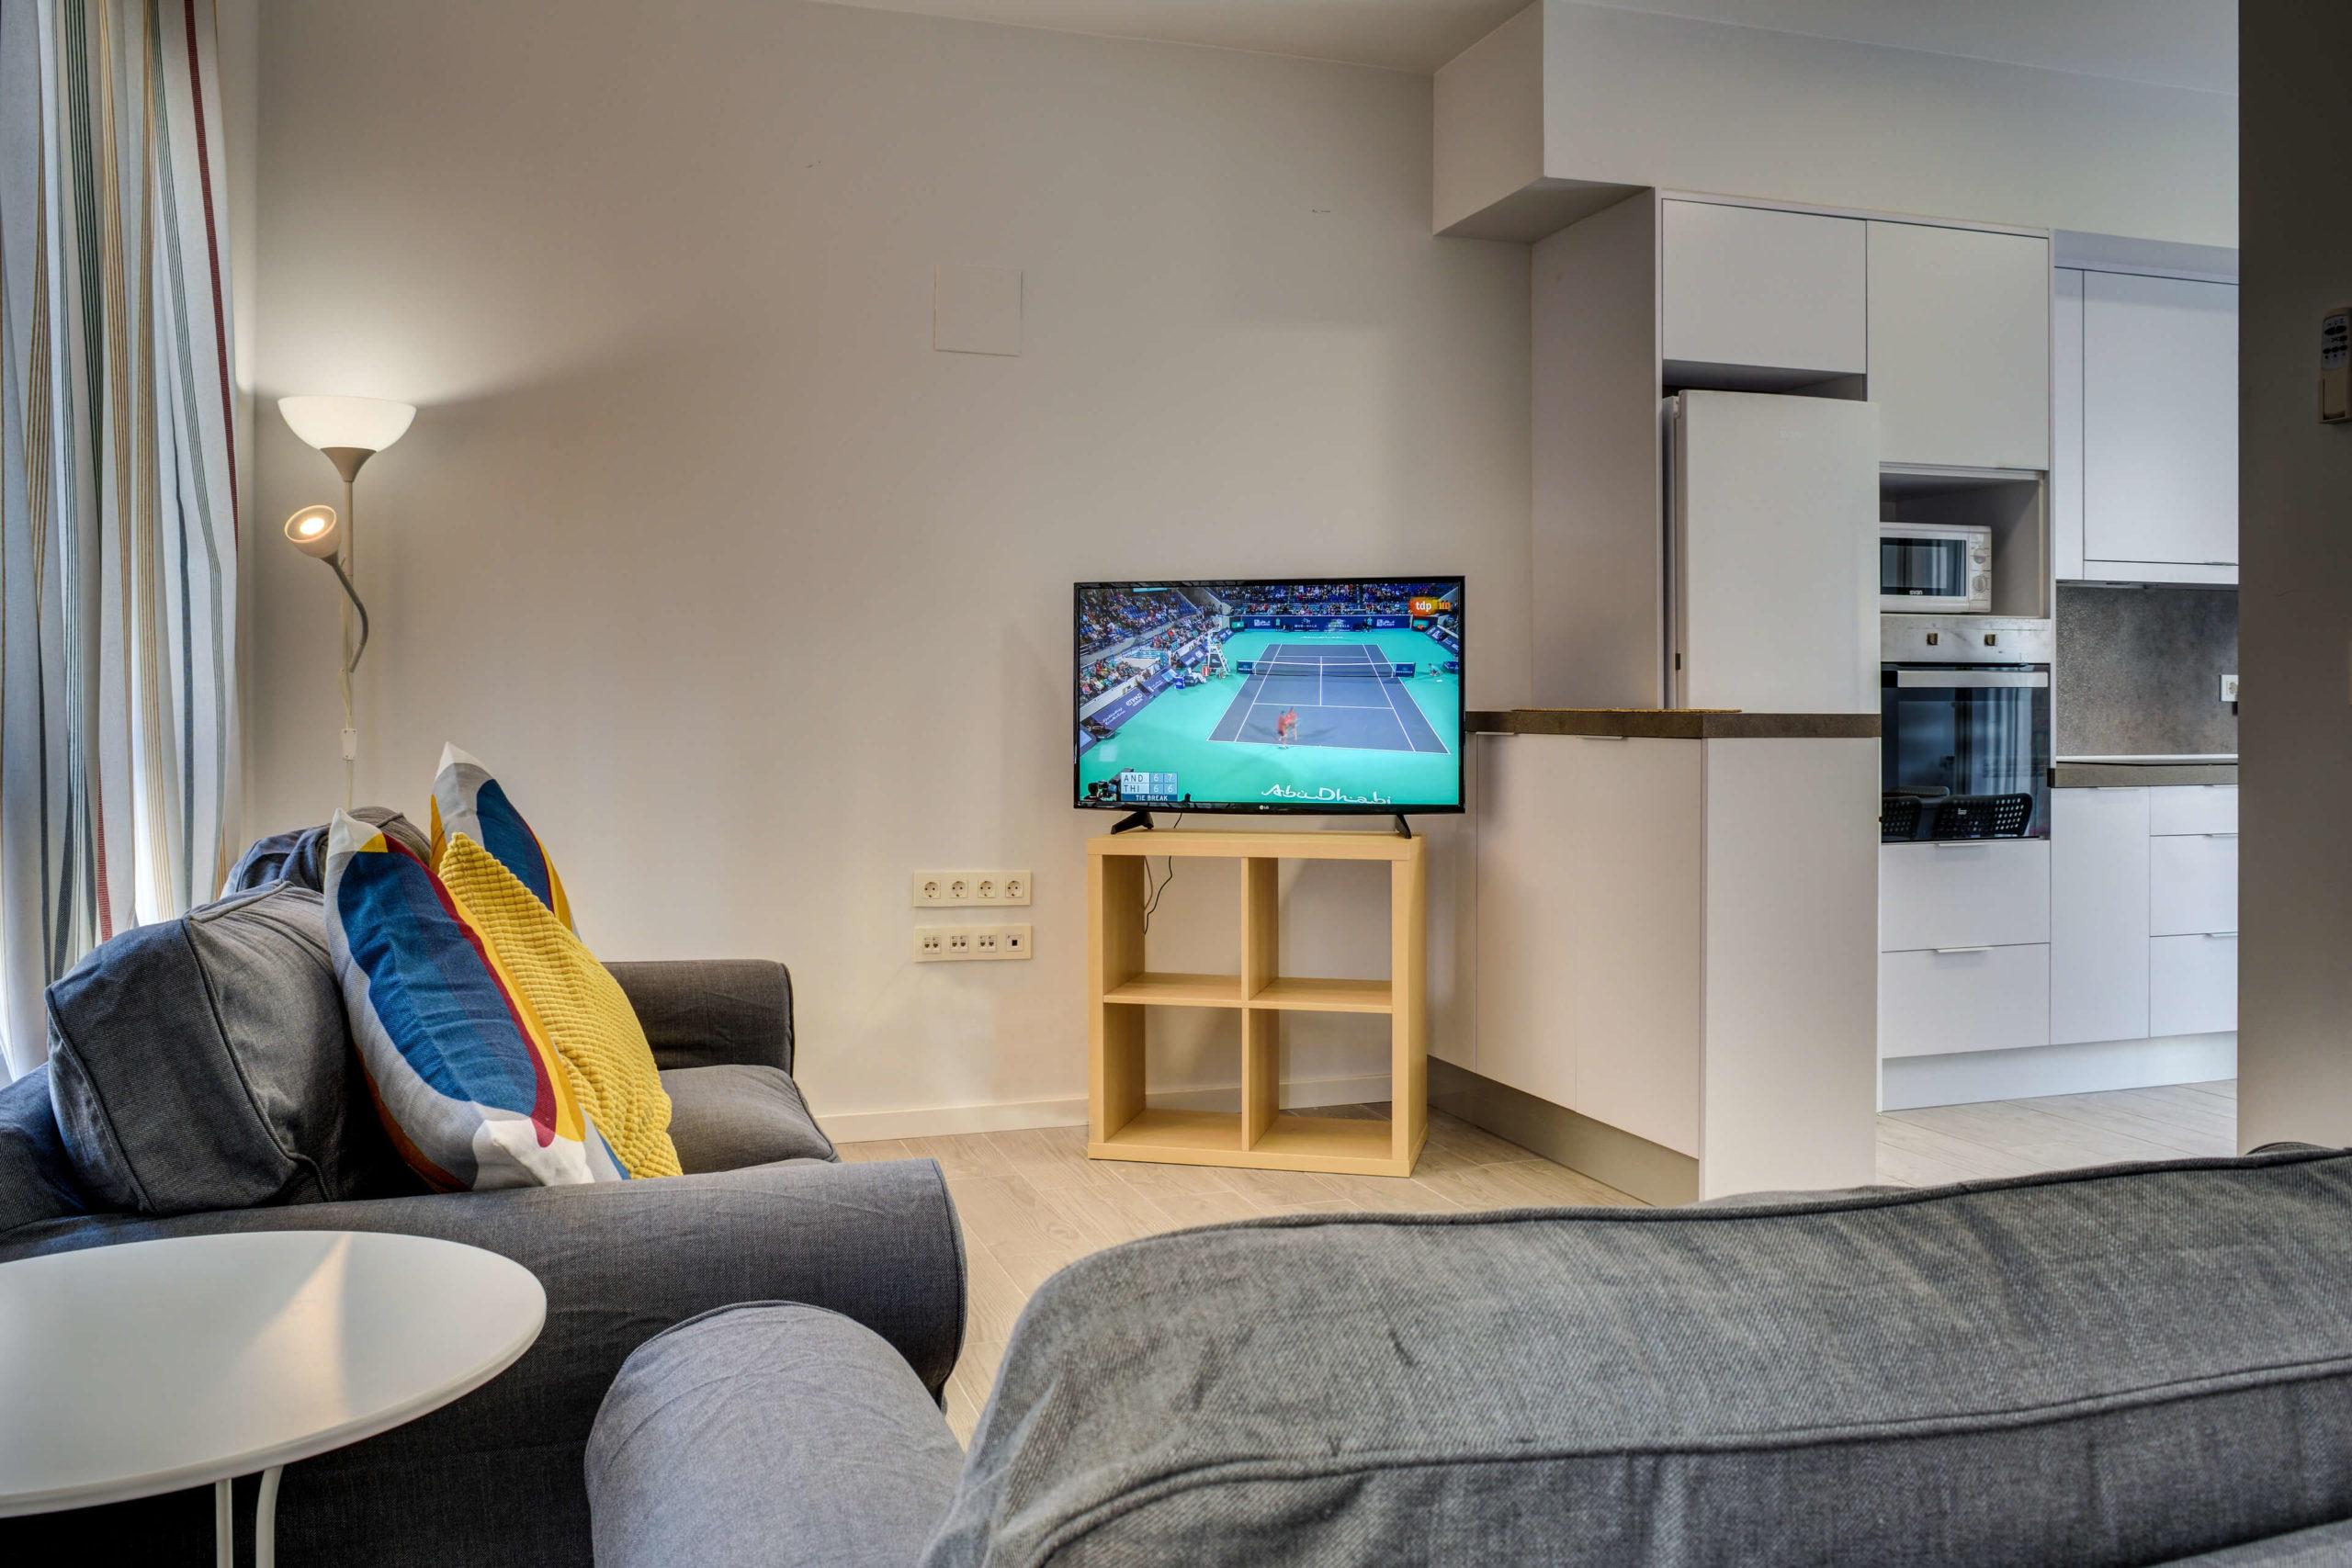 salon luminoso renovado alquiler piso compartido zaragoza